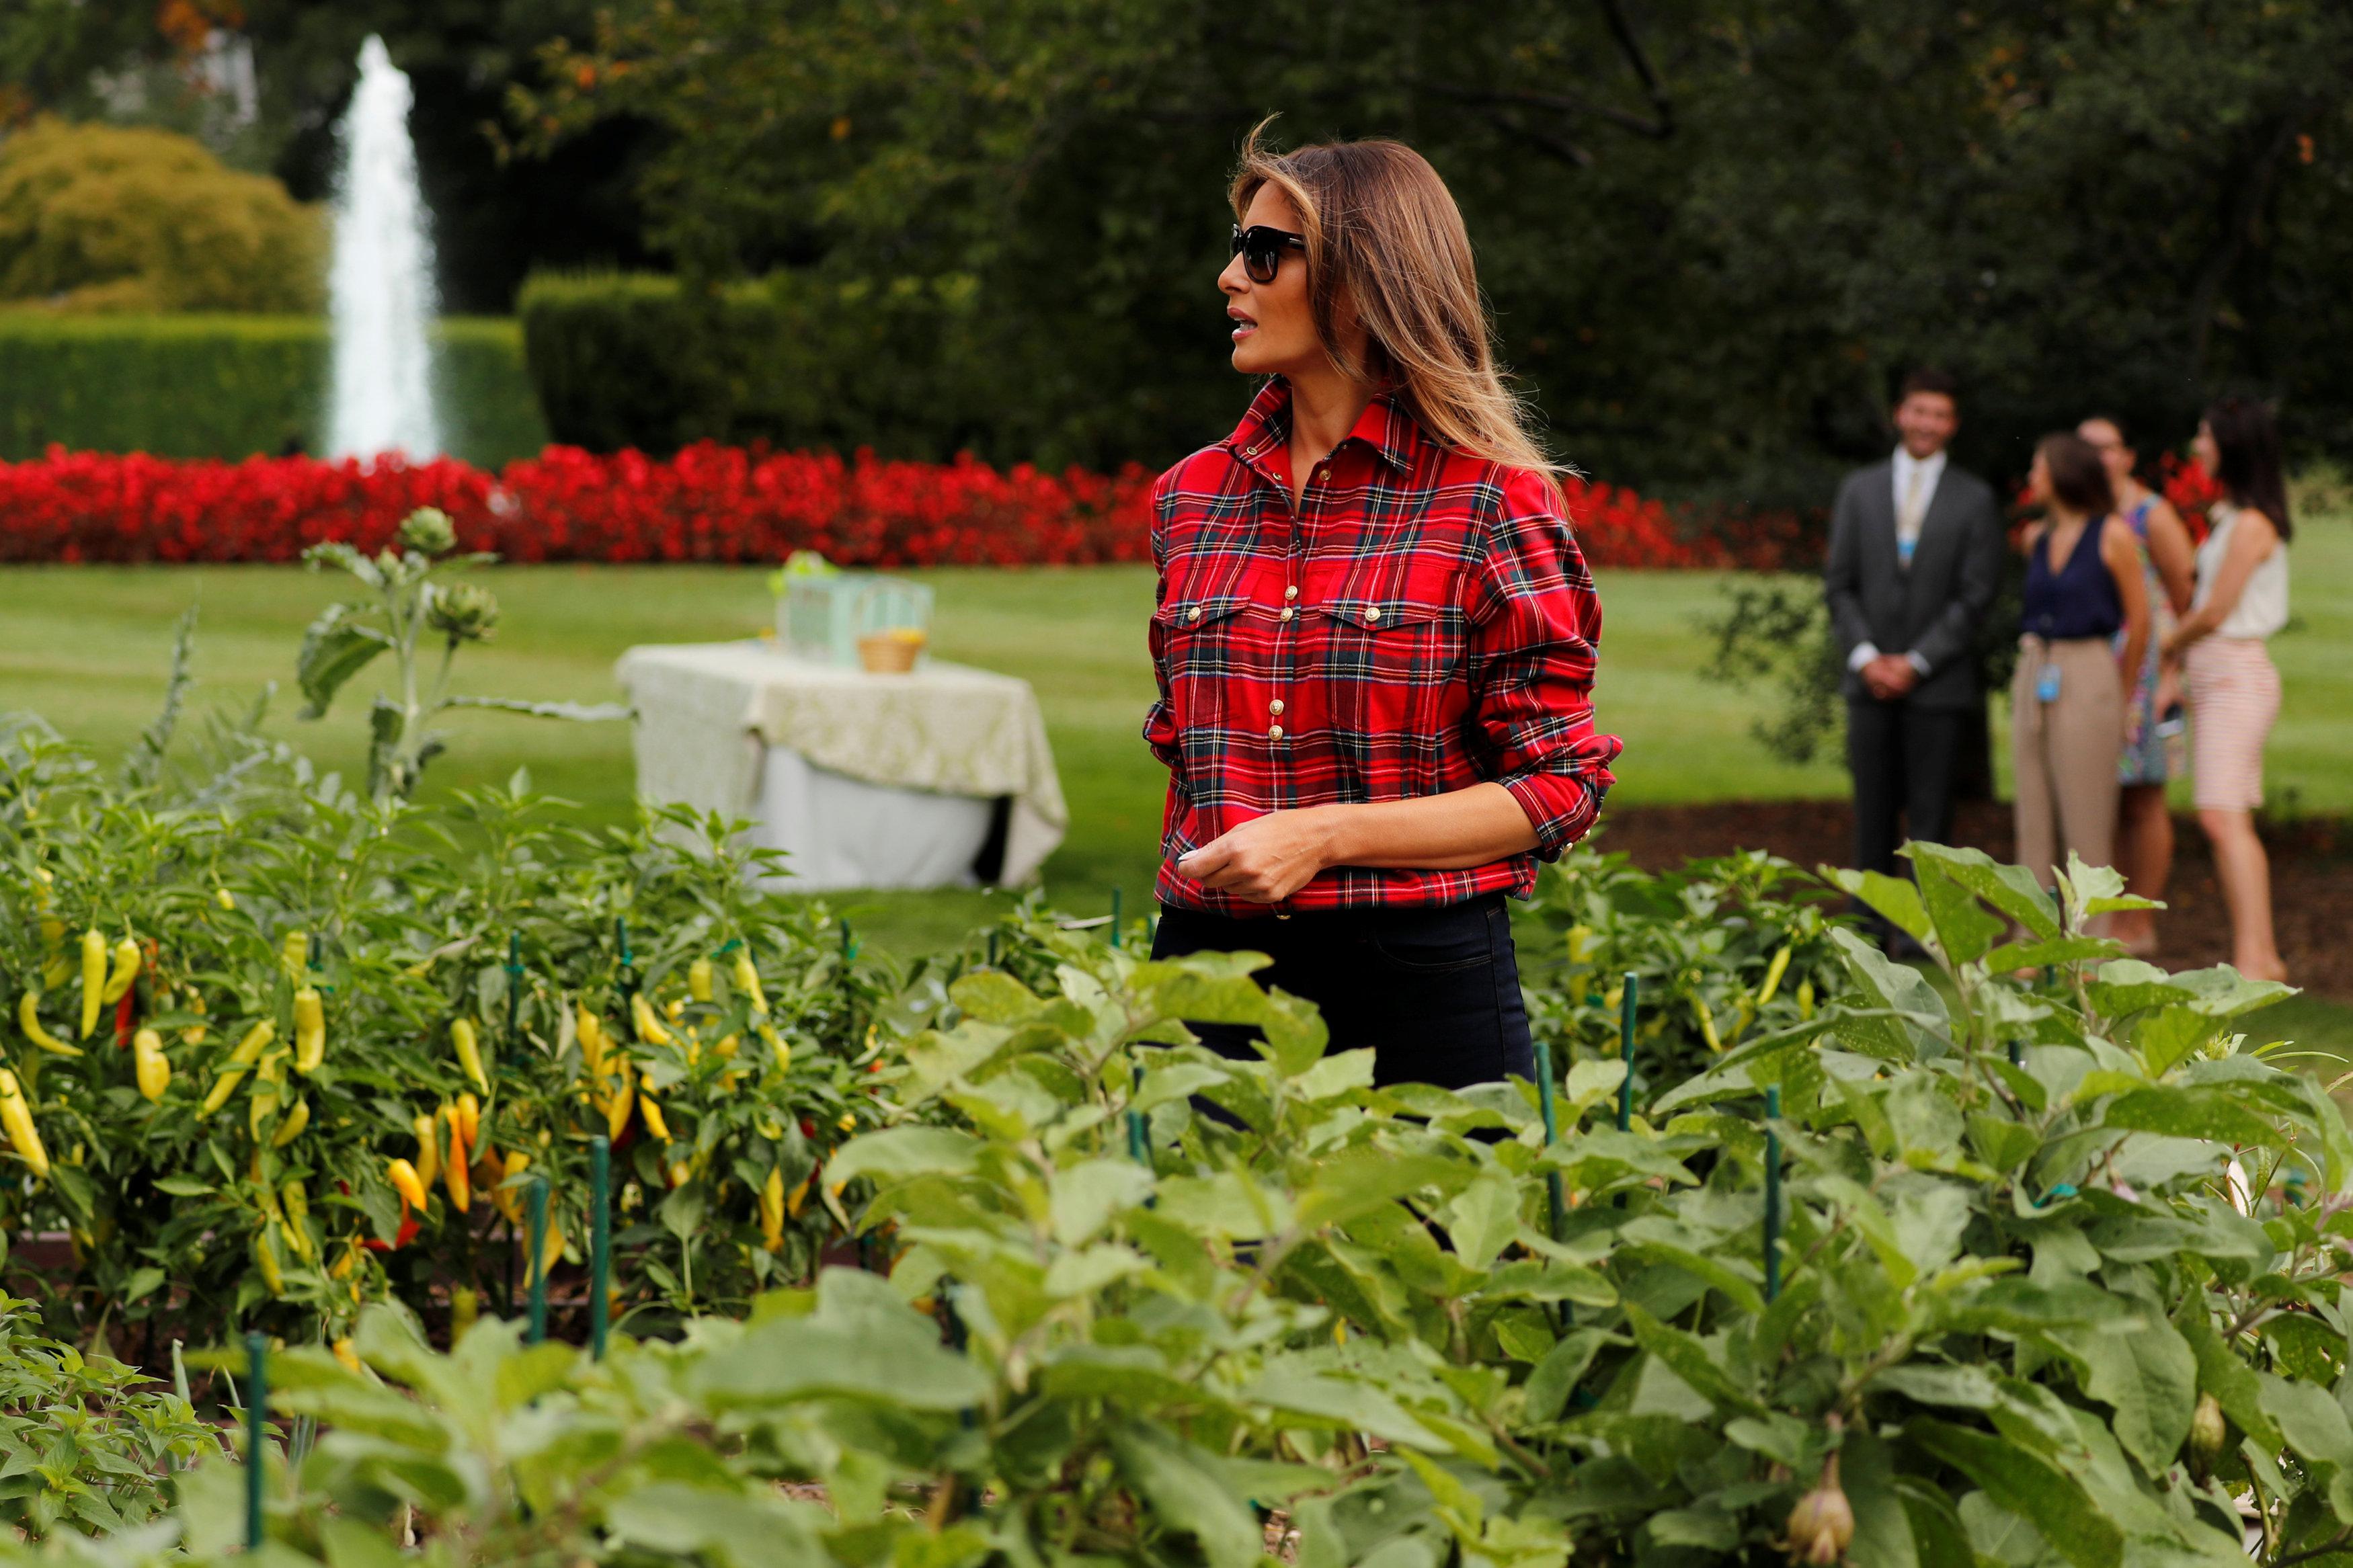 Photo of ميلانيا ترامب تشارك في زراعة حديقة البيت الأبيض (صور)